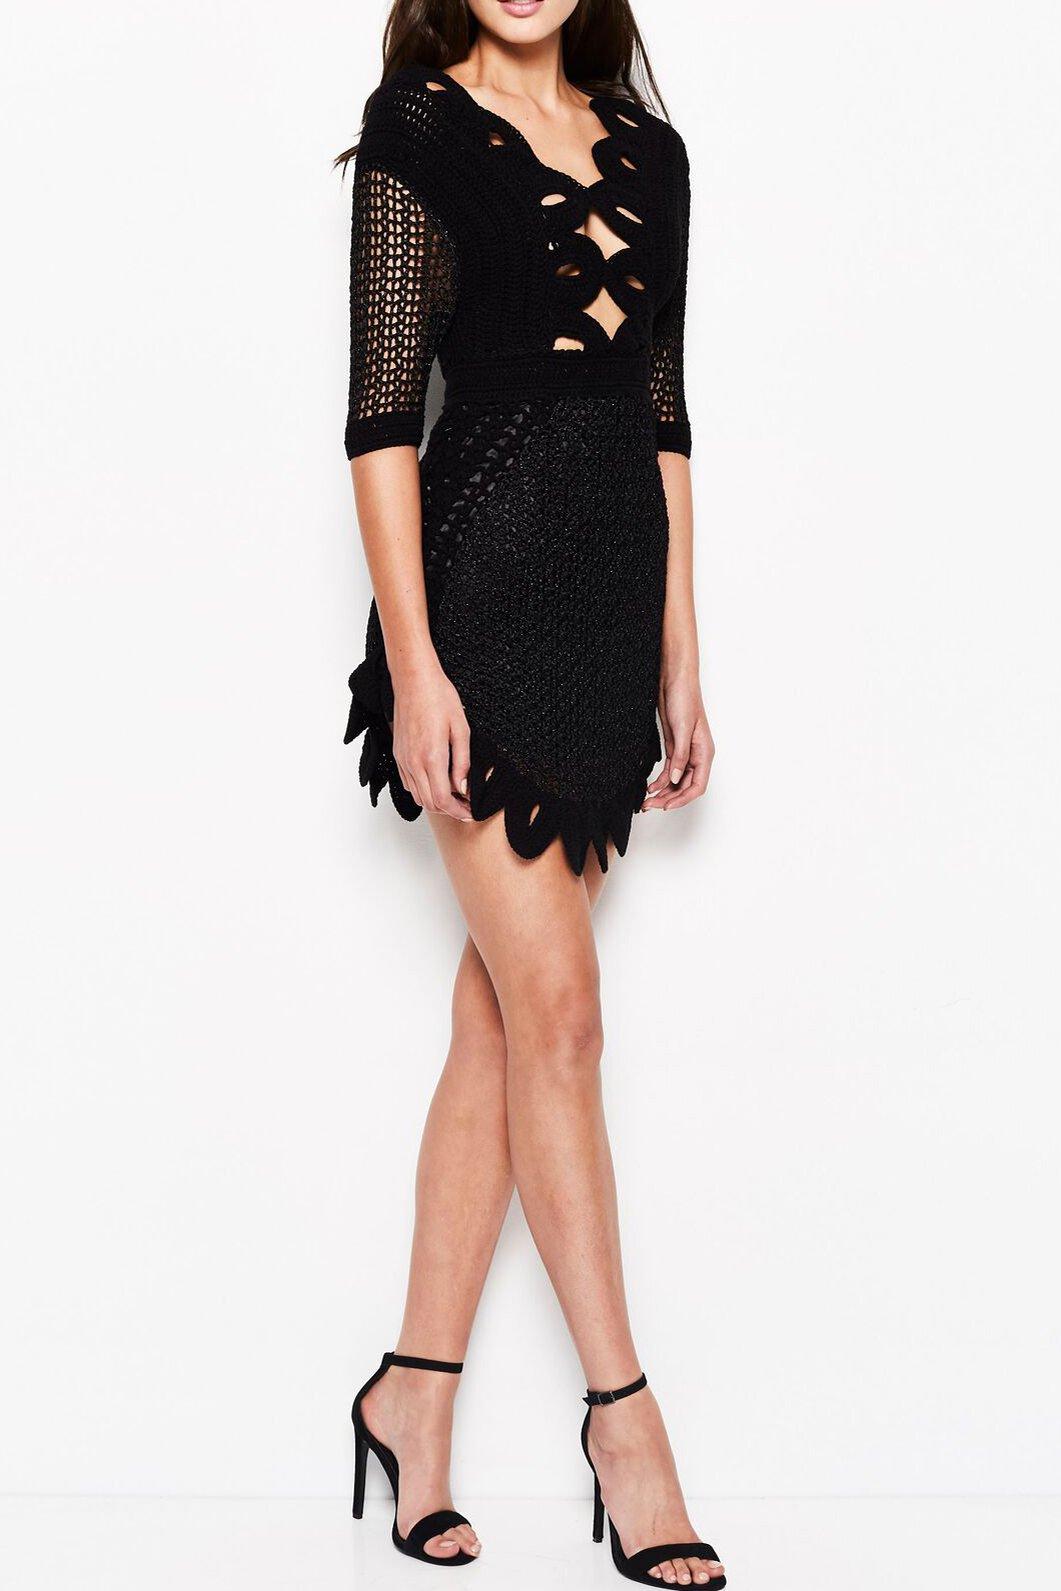 Everybody Knows Black Dress